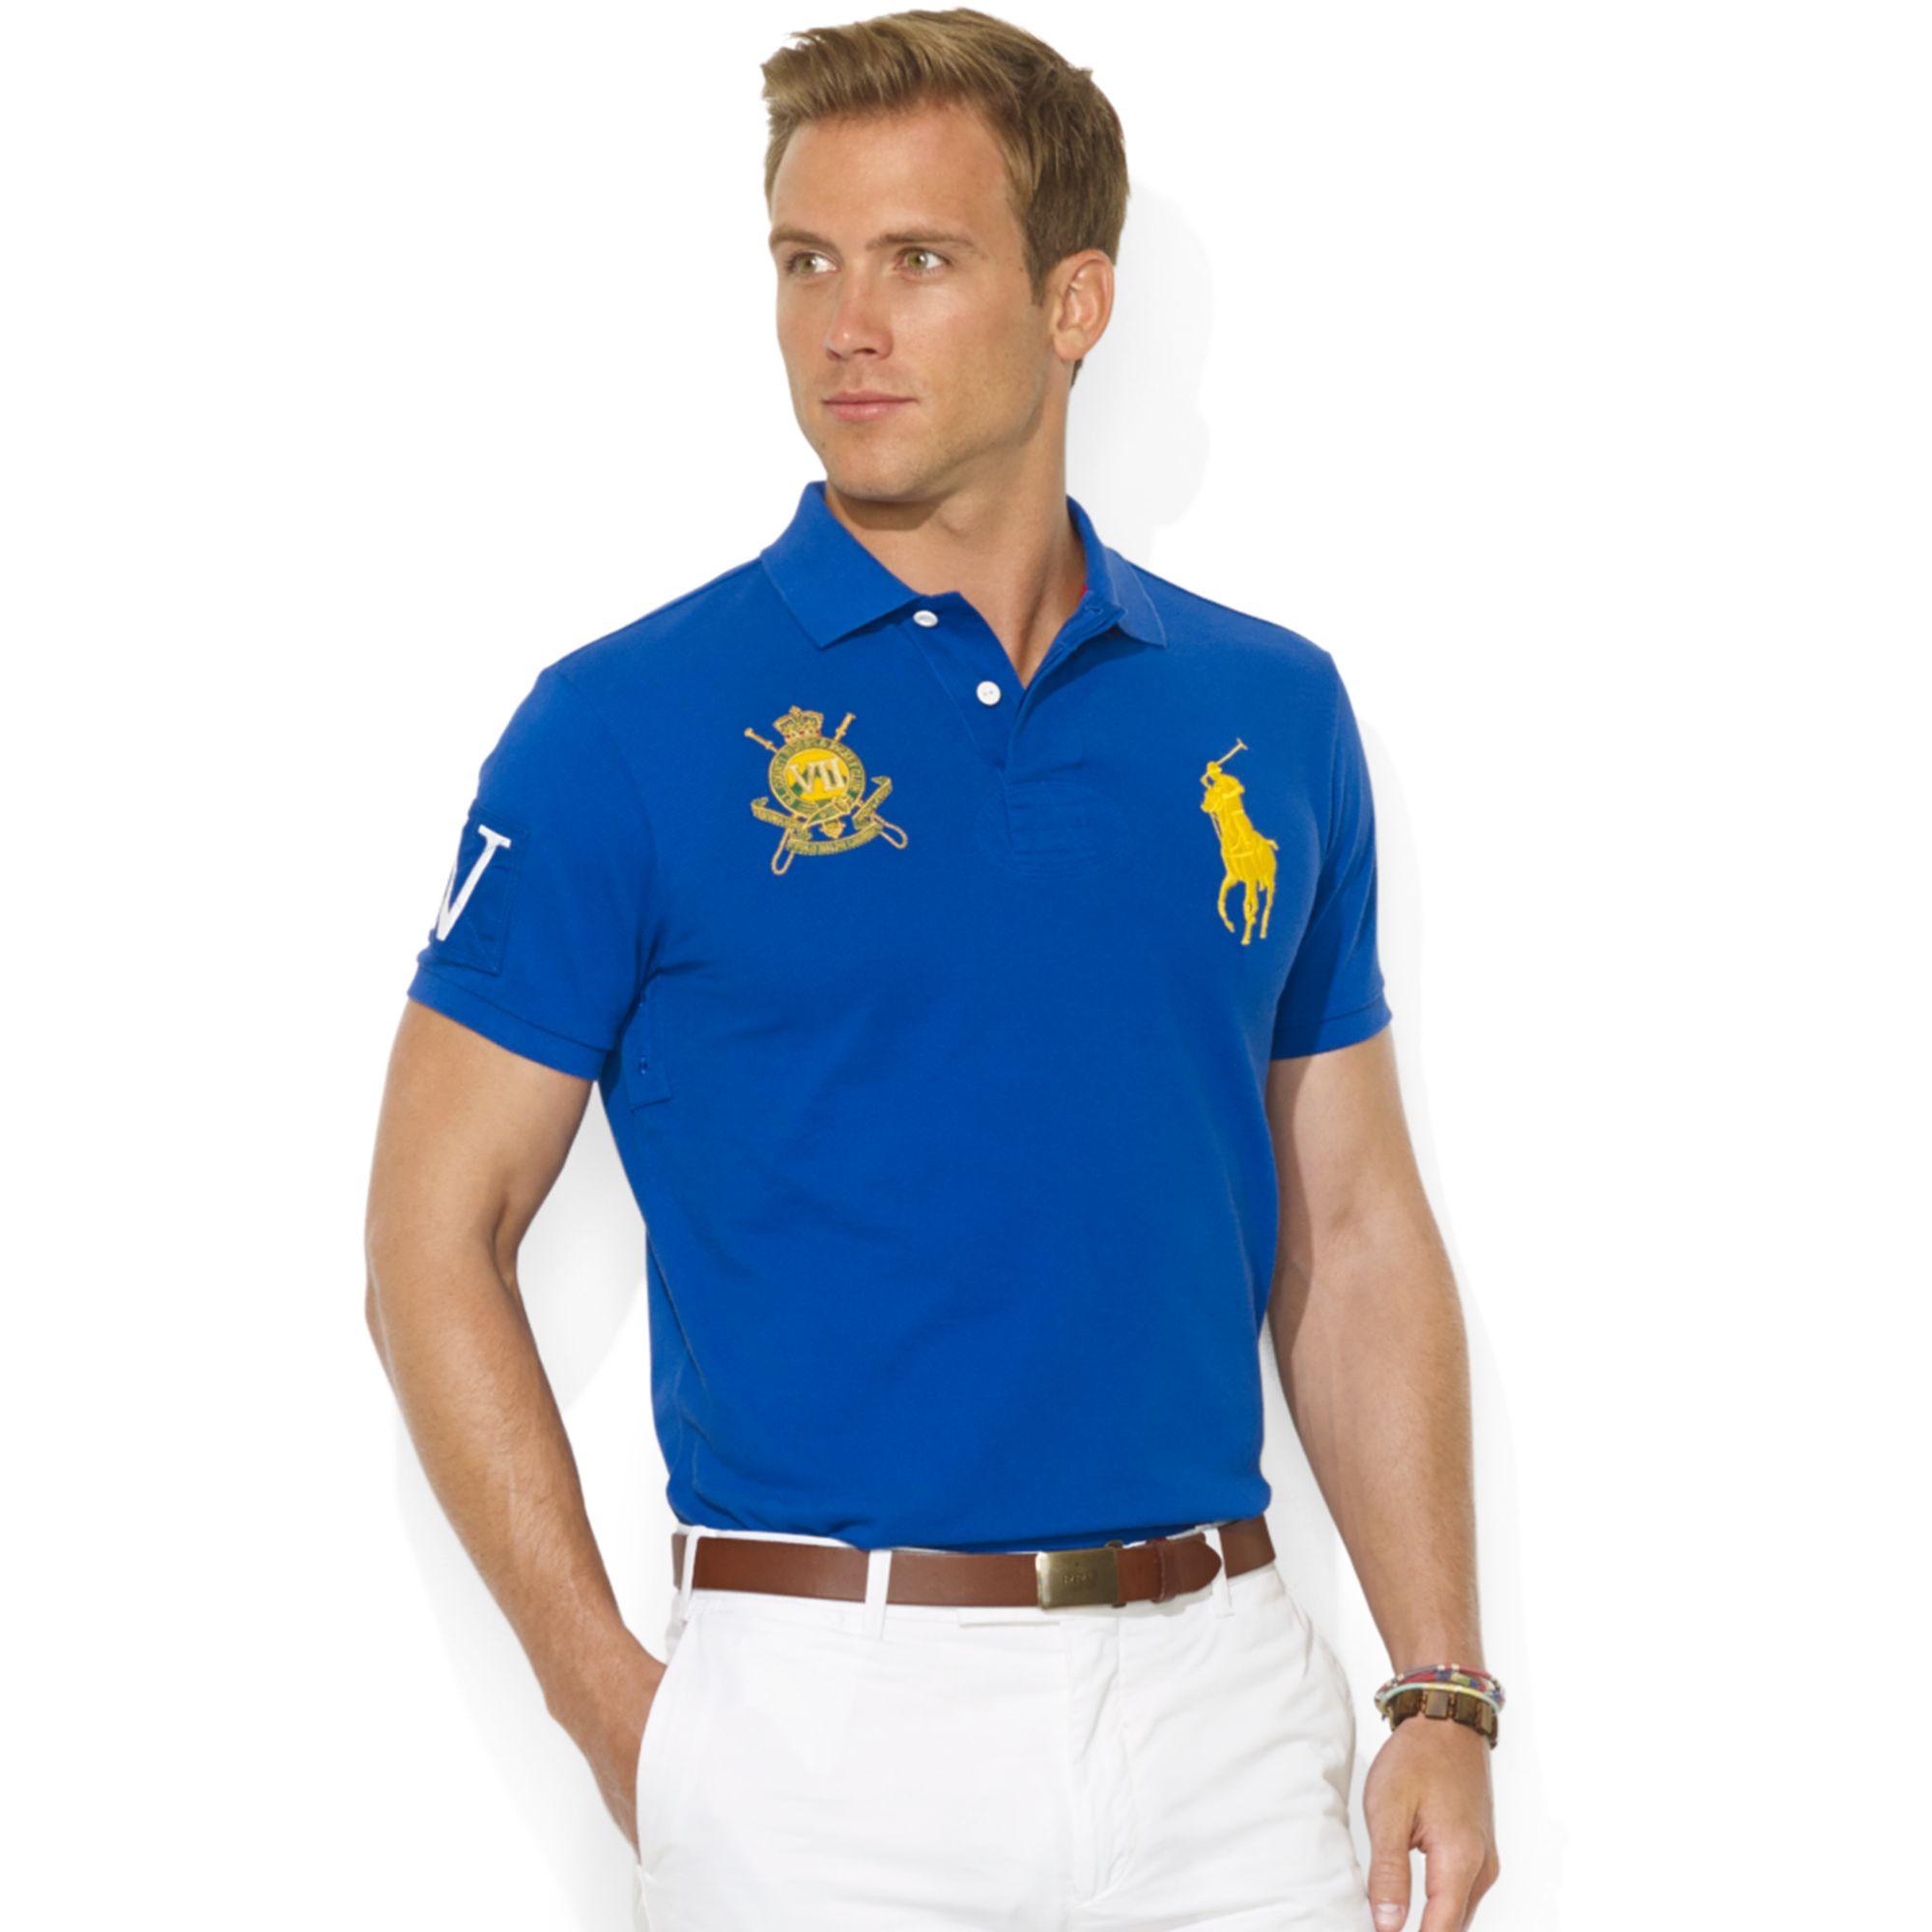 Lyst ralph lauren customfit shortsleeve jockey club polo for Ralph lauren polo club shirts